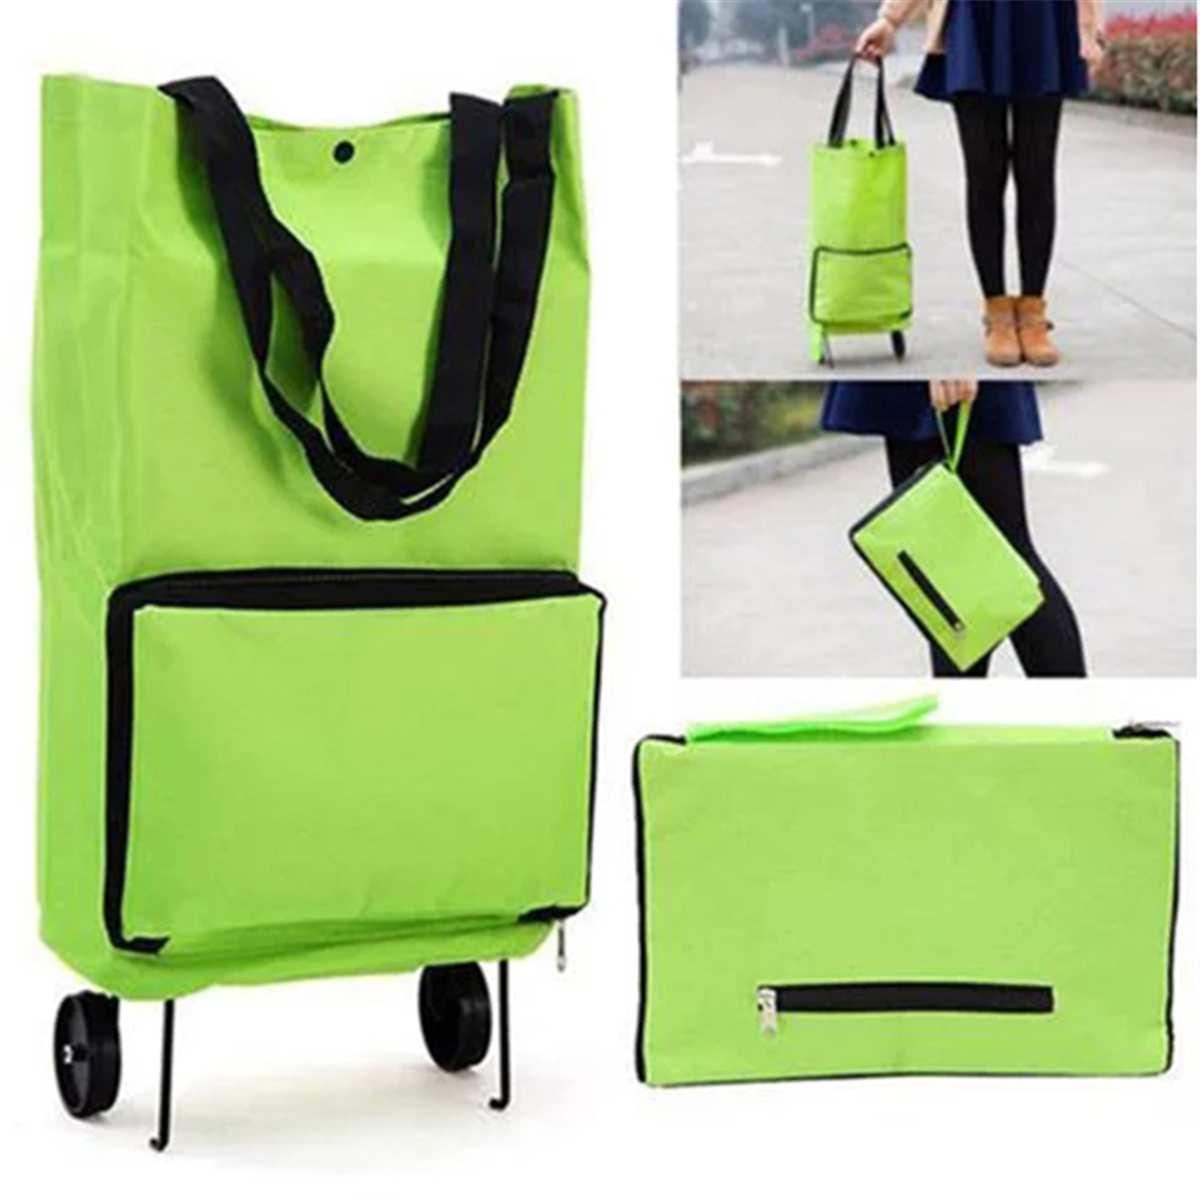 Reusable Folding Portable Shopping Bags Buy Vegetables Bag High Capacity Shopping Food Organizer Trolley Bag Wheels Bag Handbag